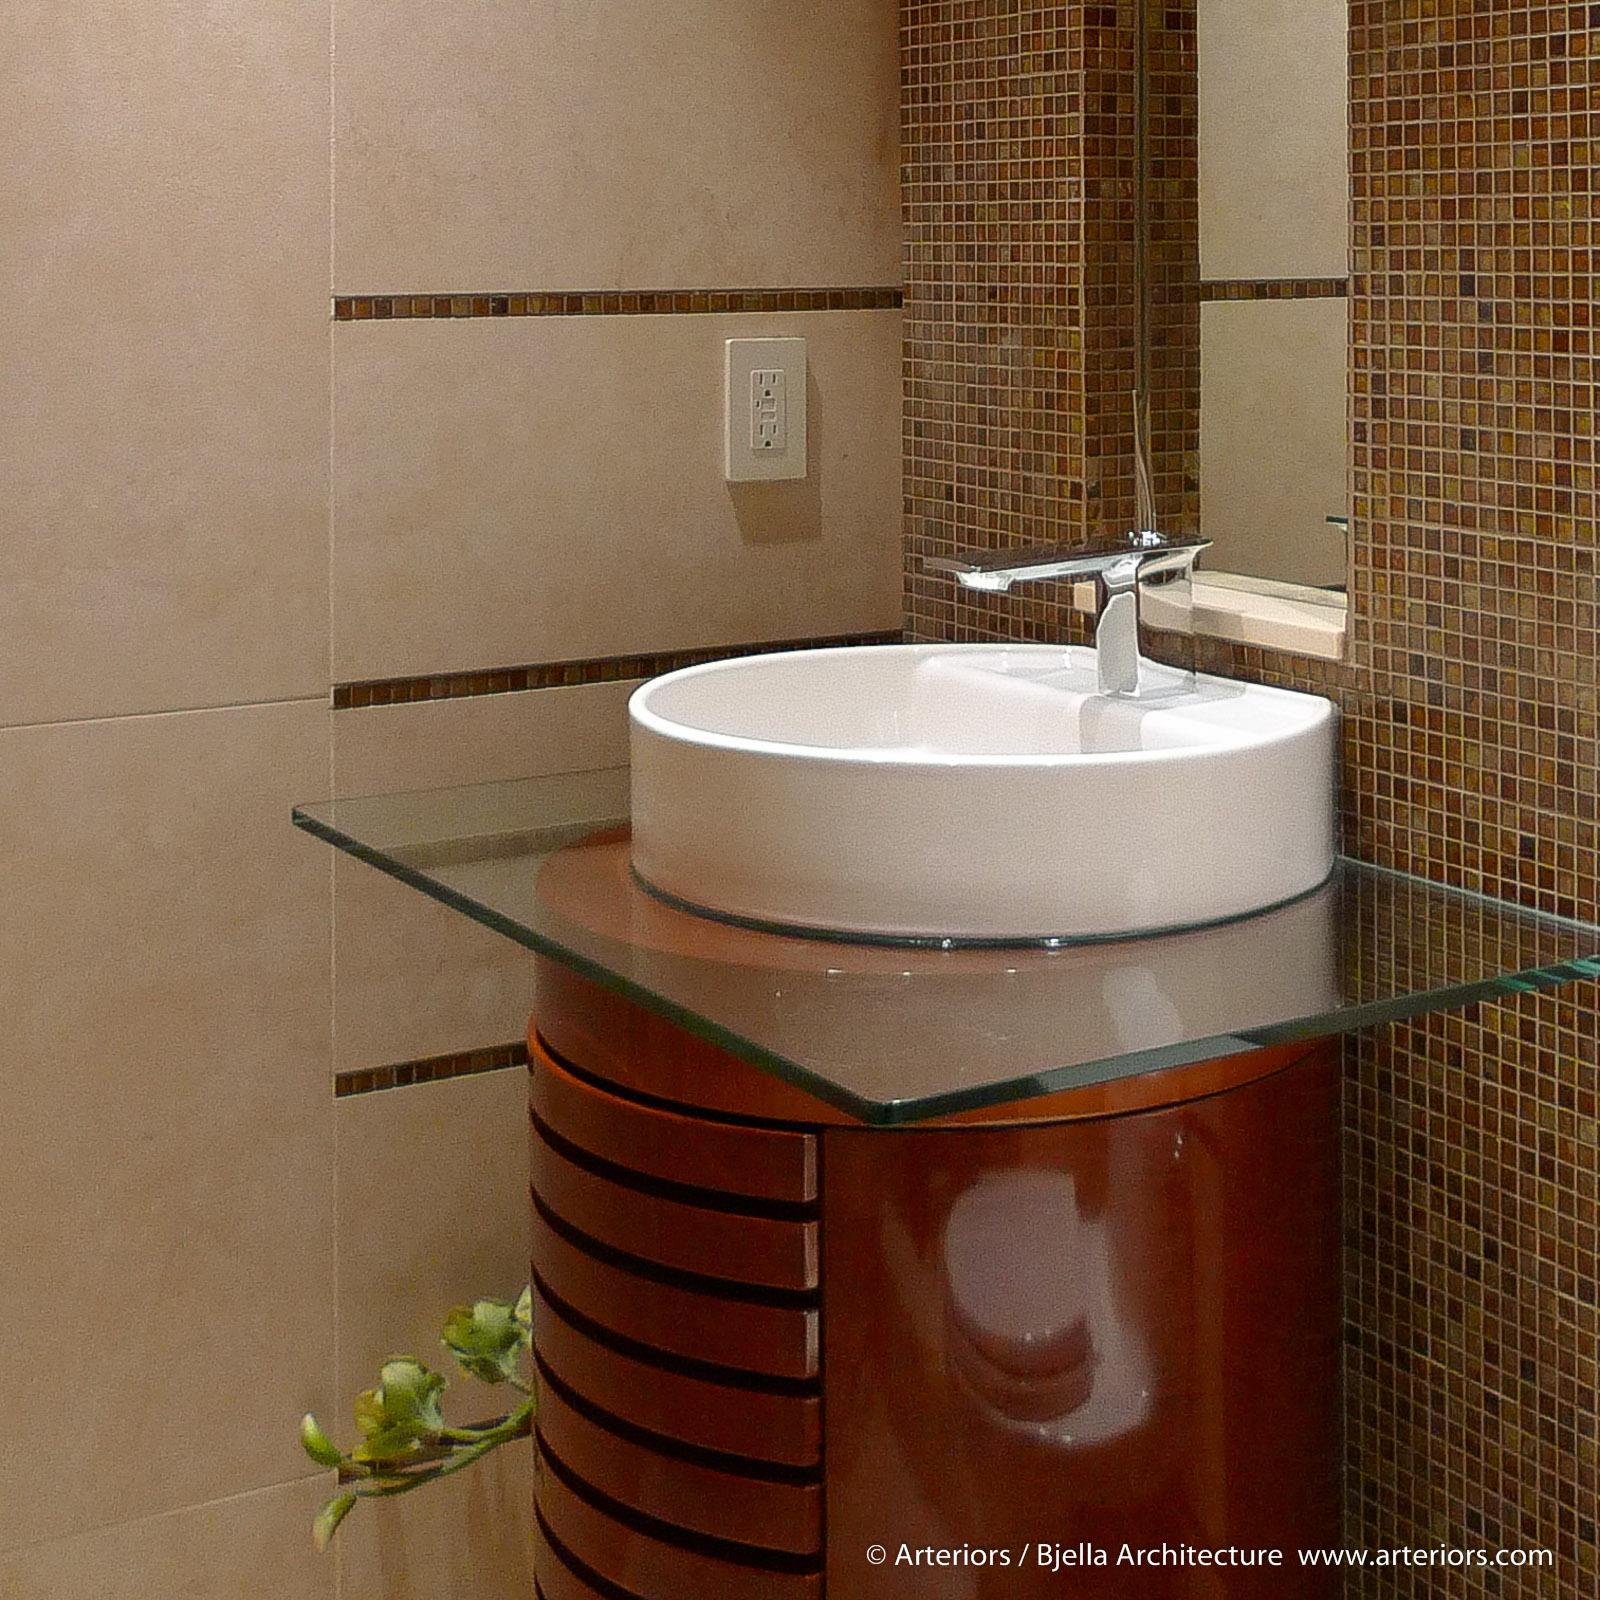 Tiny Round Cylinder Bathroom Vanity by Tim Bjella of Arteriors Architects-2